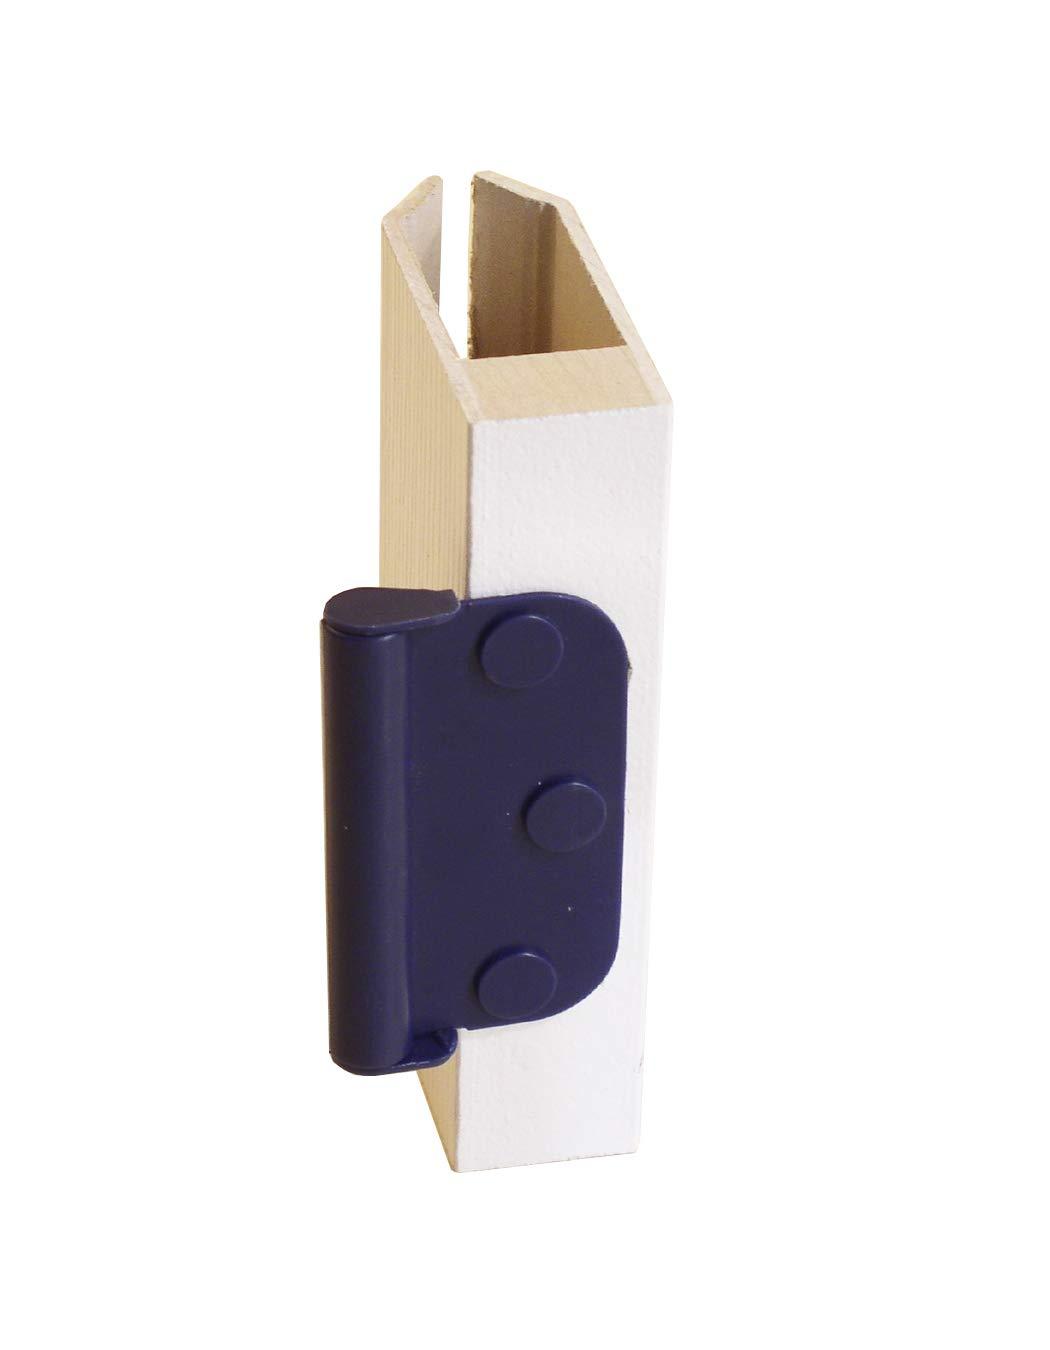 Hinge Mask Carton Quantity 50